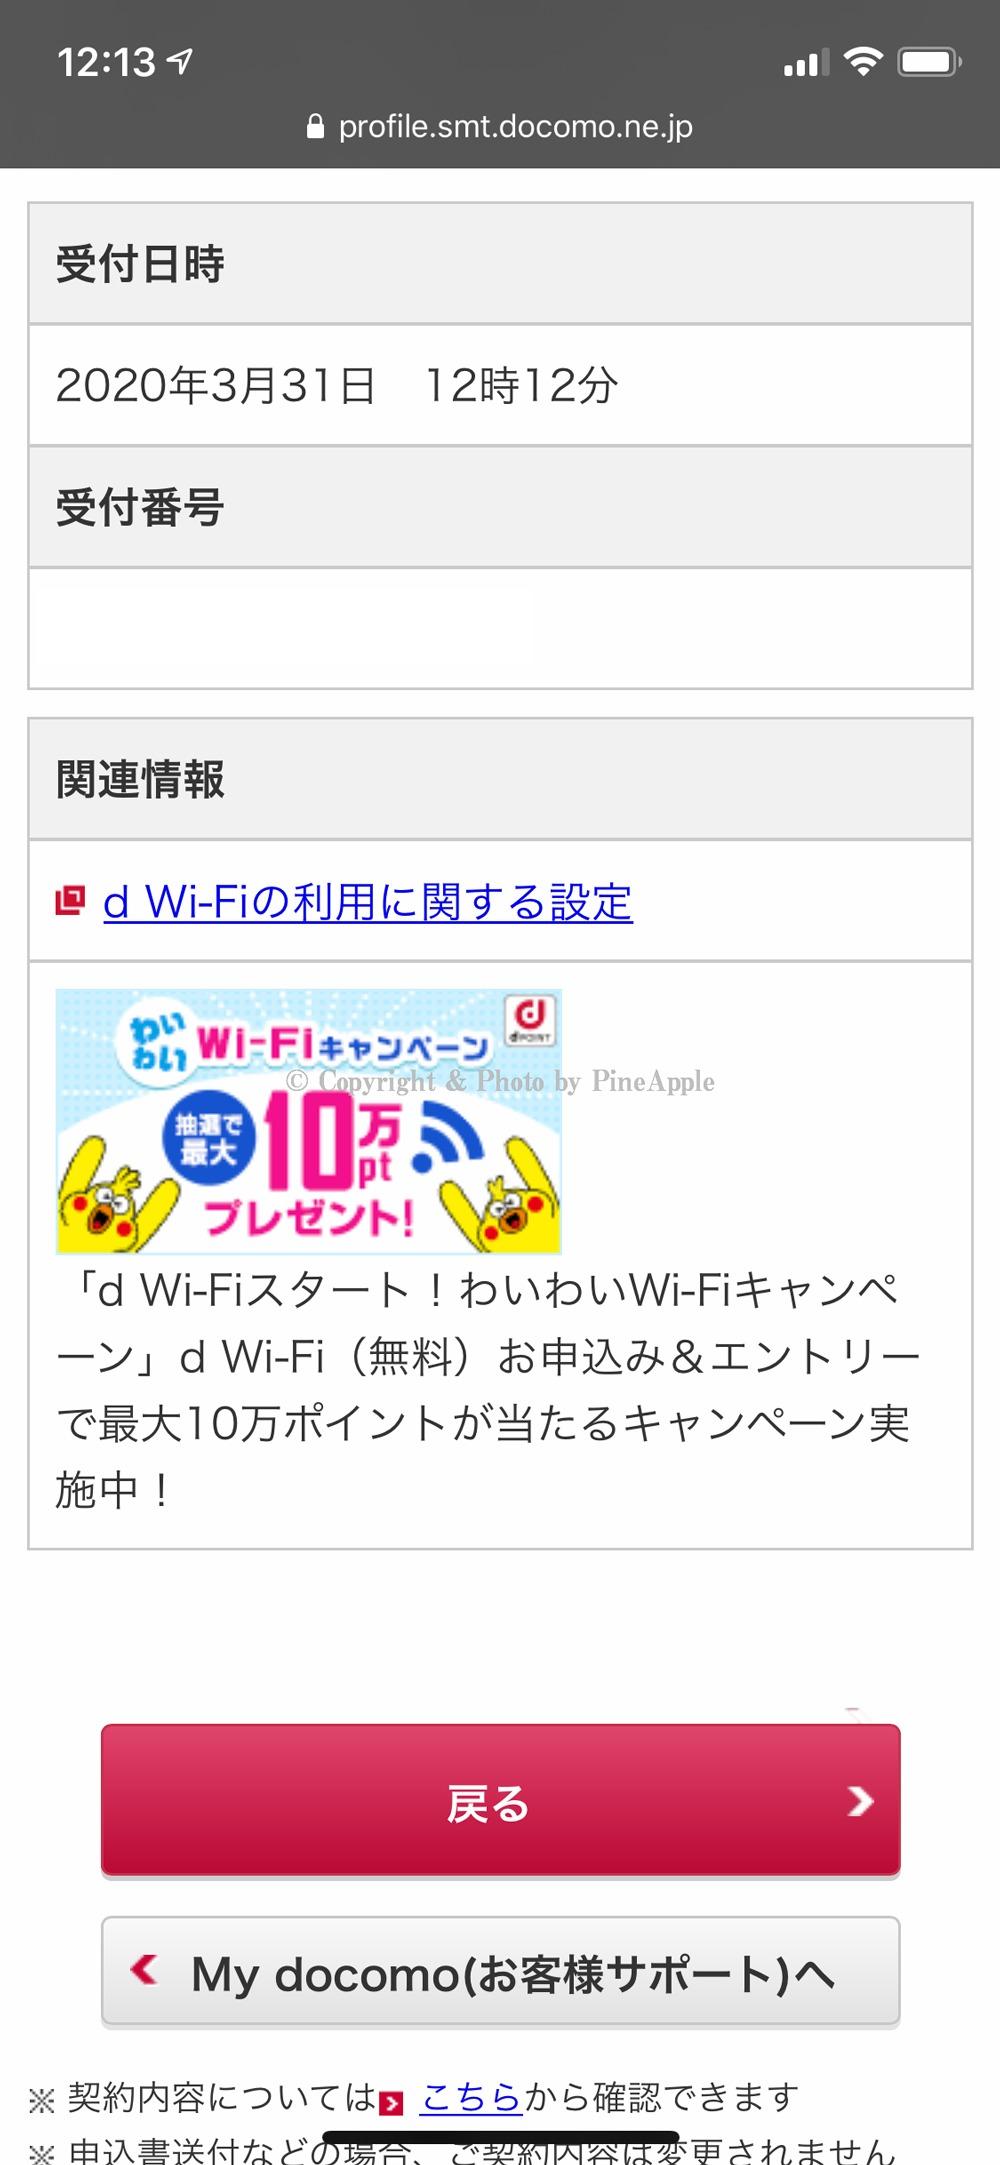 d Wi-Fi:「手続き完了」画面を確認